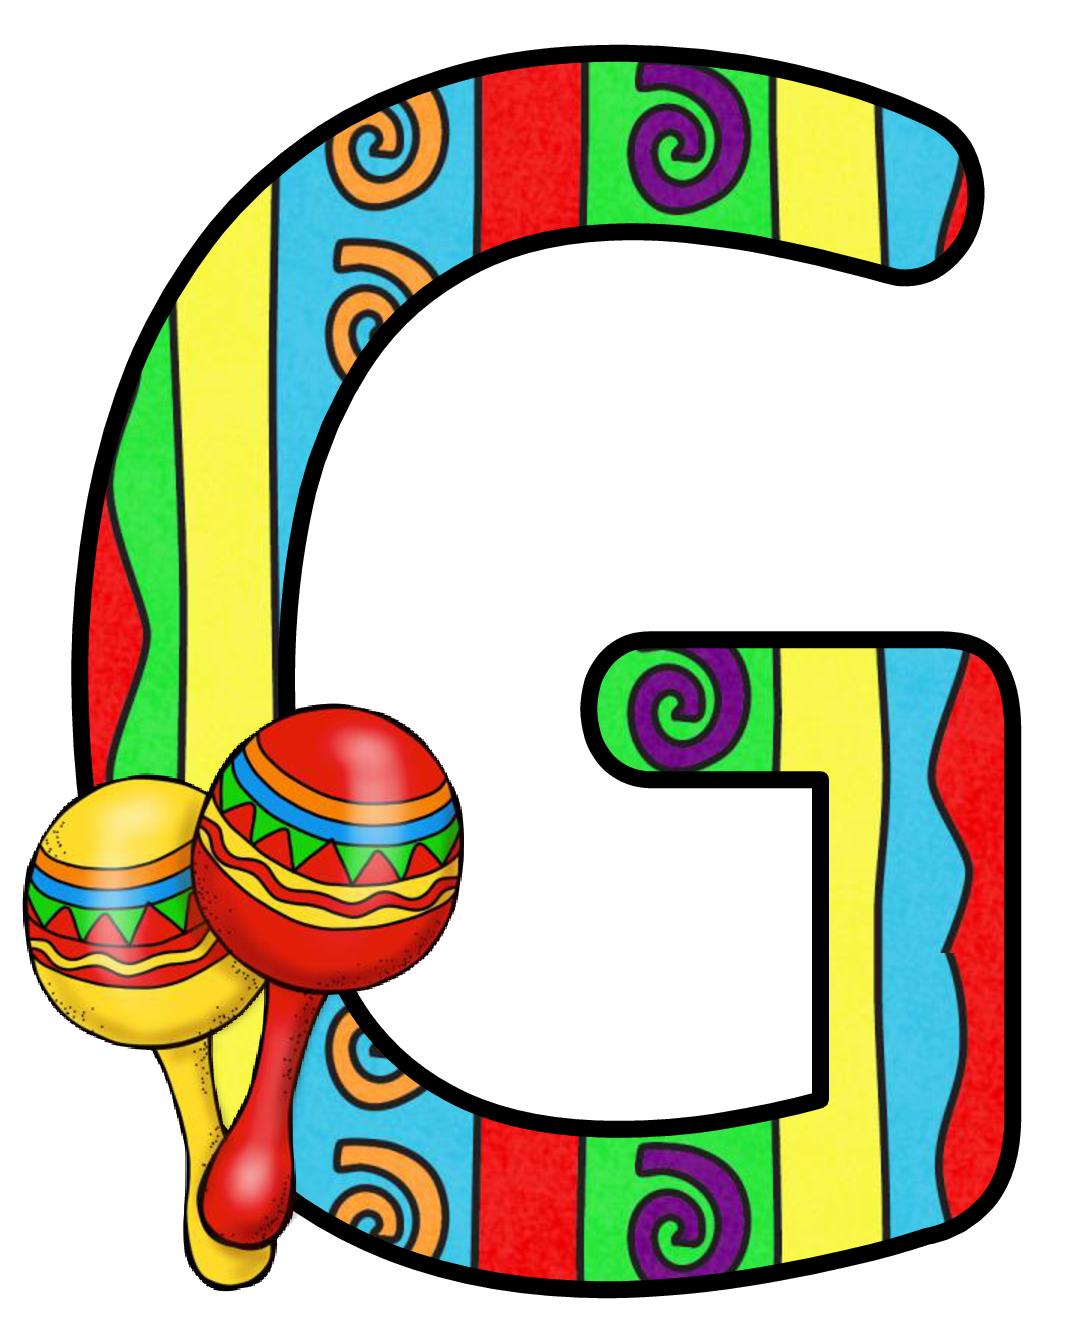 Ch b alfabeto may. Queen clipart alphabet q